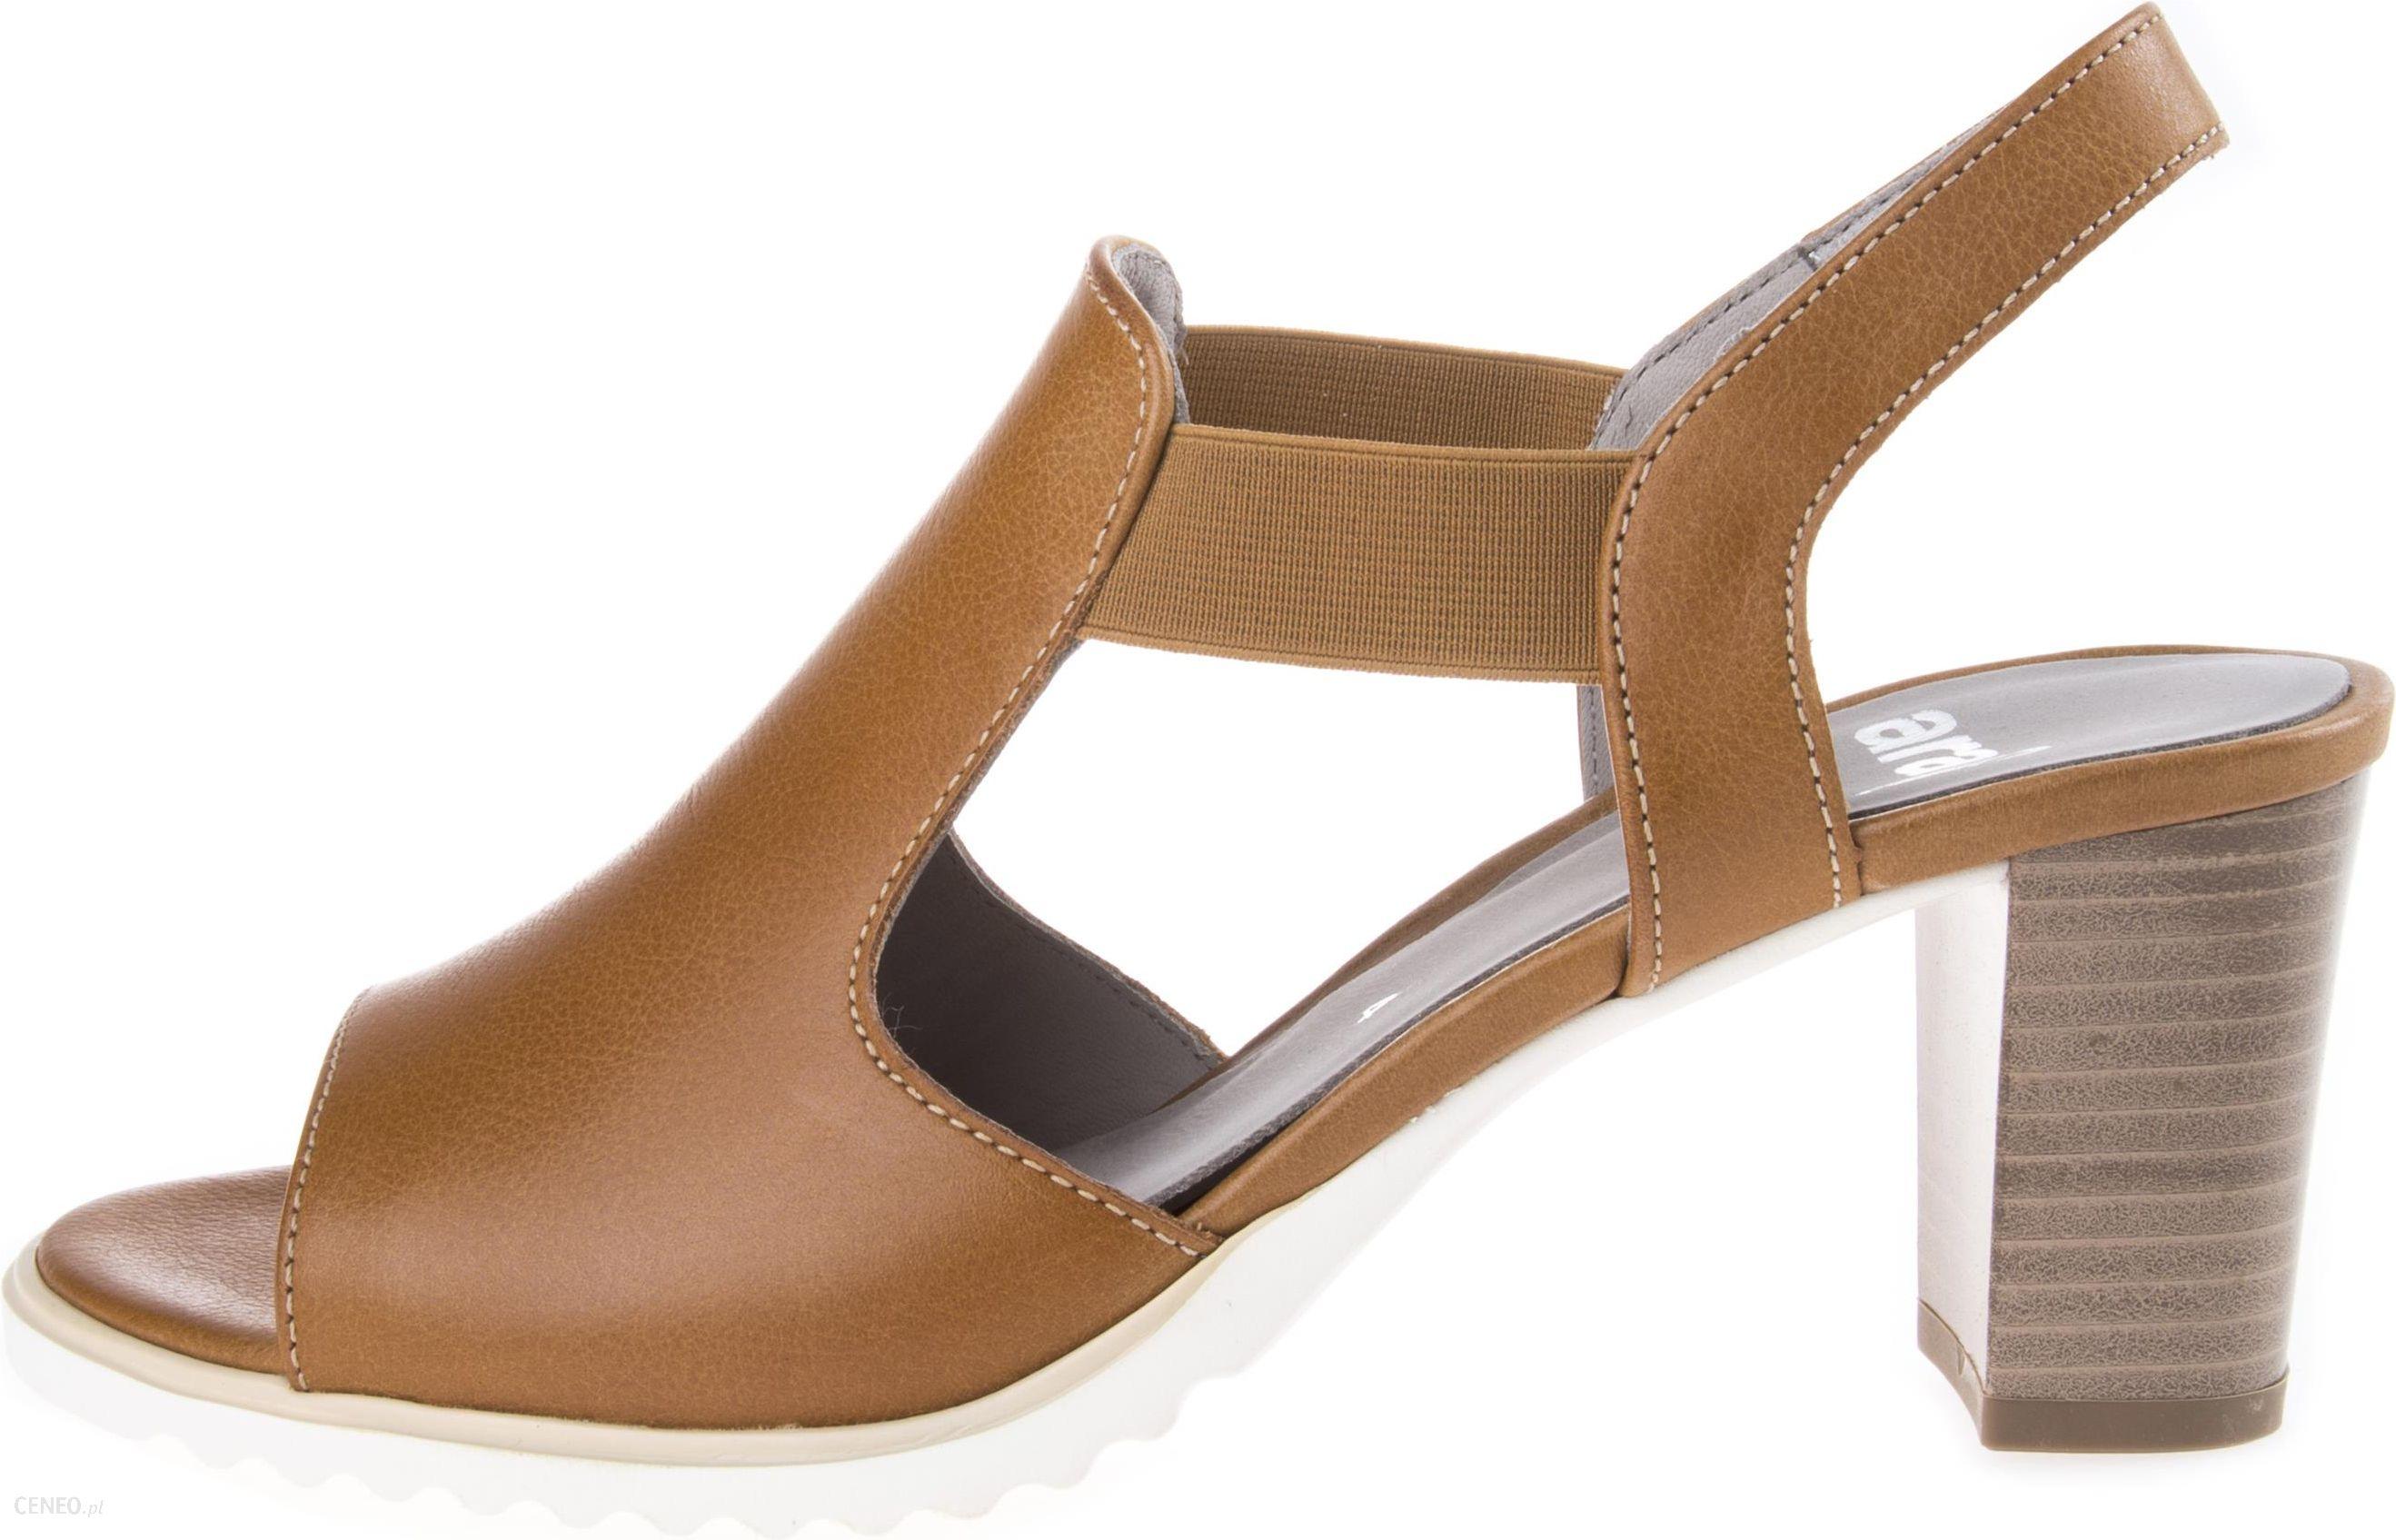 1bbe6954ddbc7 Ara shoes Grenoble-Sand Buty na obcasie Brązowy 37 - Ceny i opinie ...